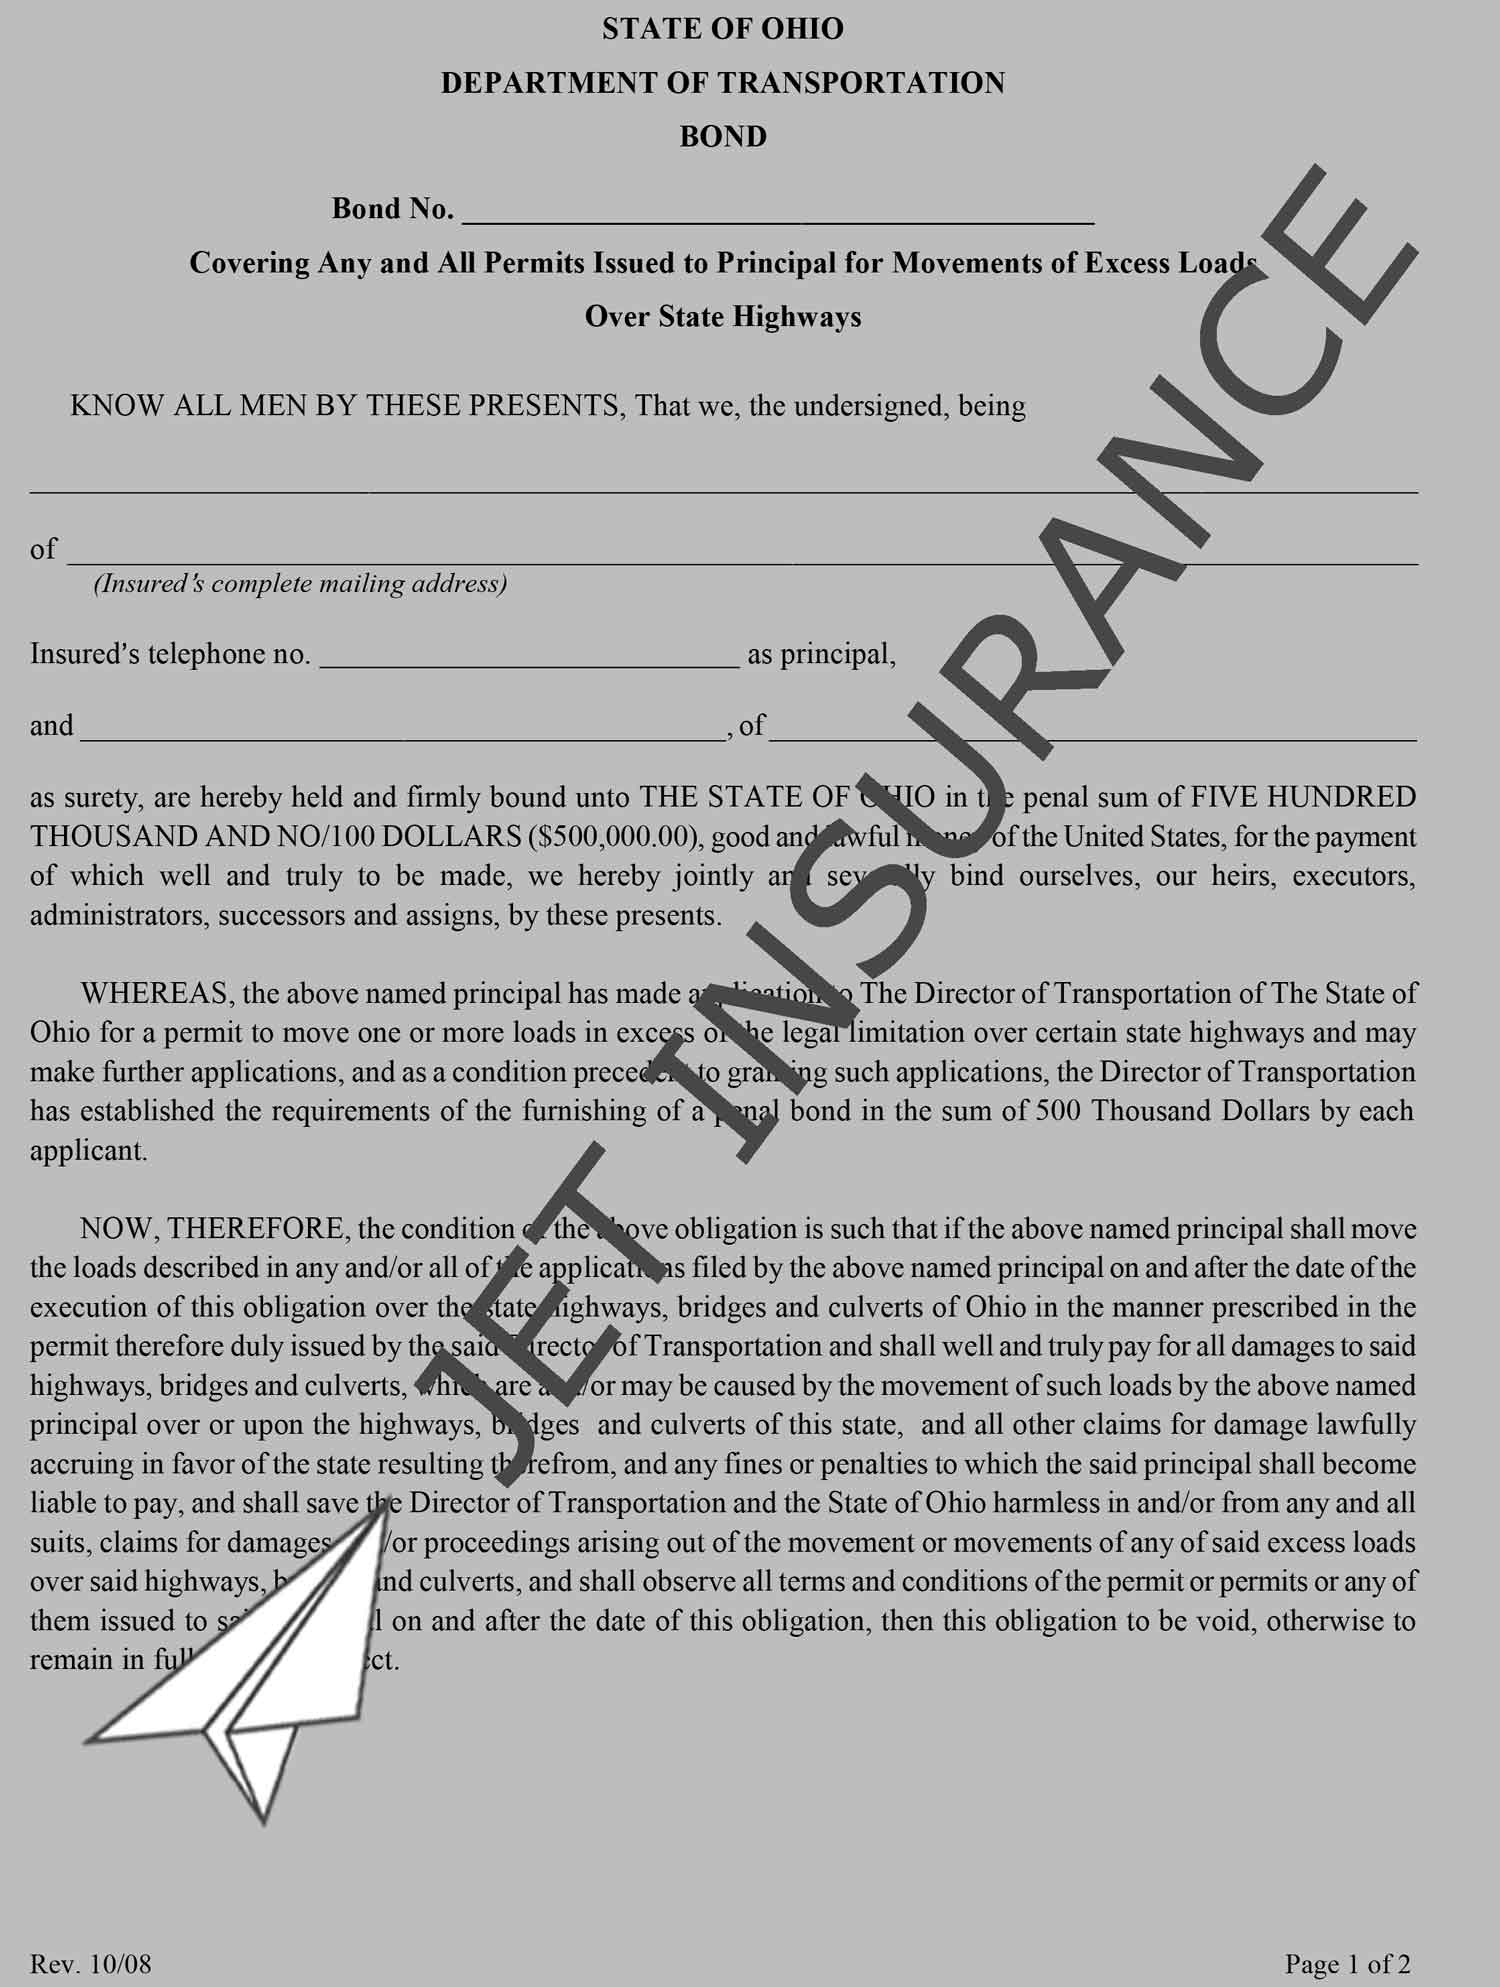 Ohio City of Medina Special Hauling Permit Bond Form